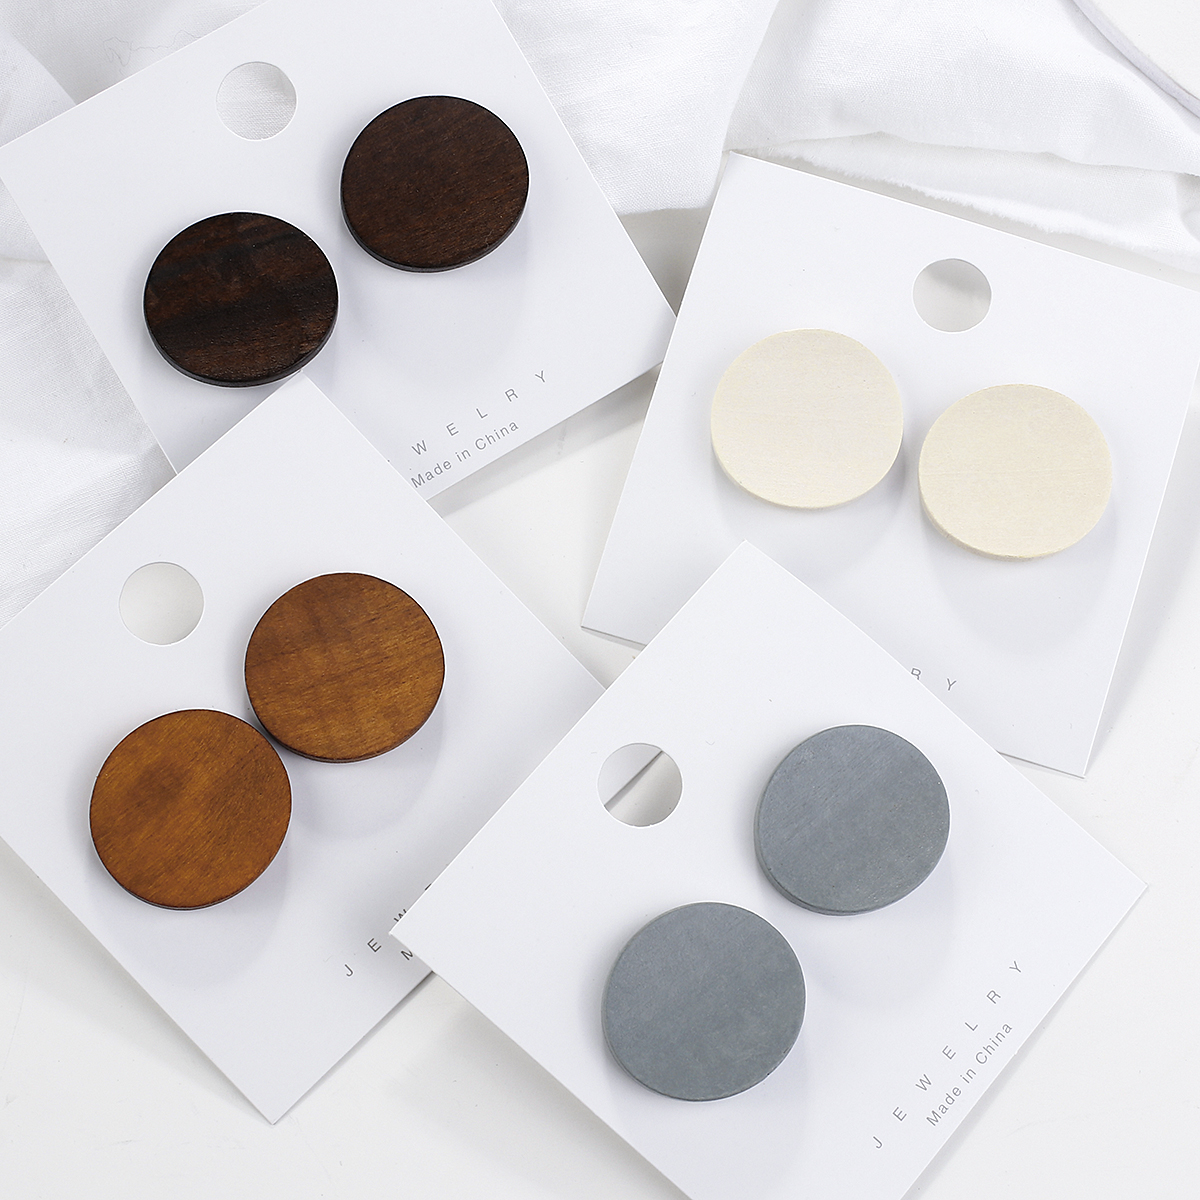 AENSOA New Trendy Round Wooden Earrings For Women 2020 Vintage 4 Color Wood Statement Pendant Earrings Costume Jewellery Gift